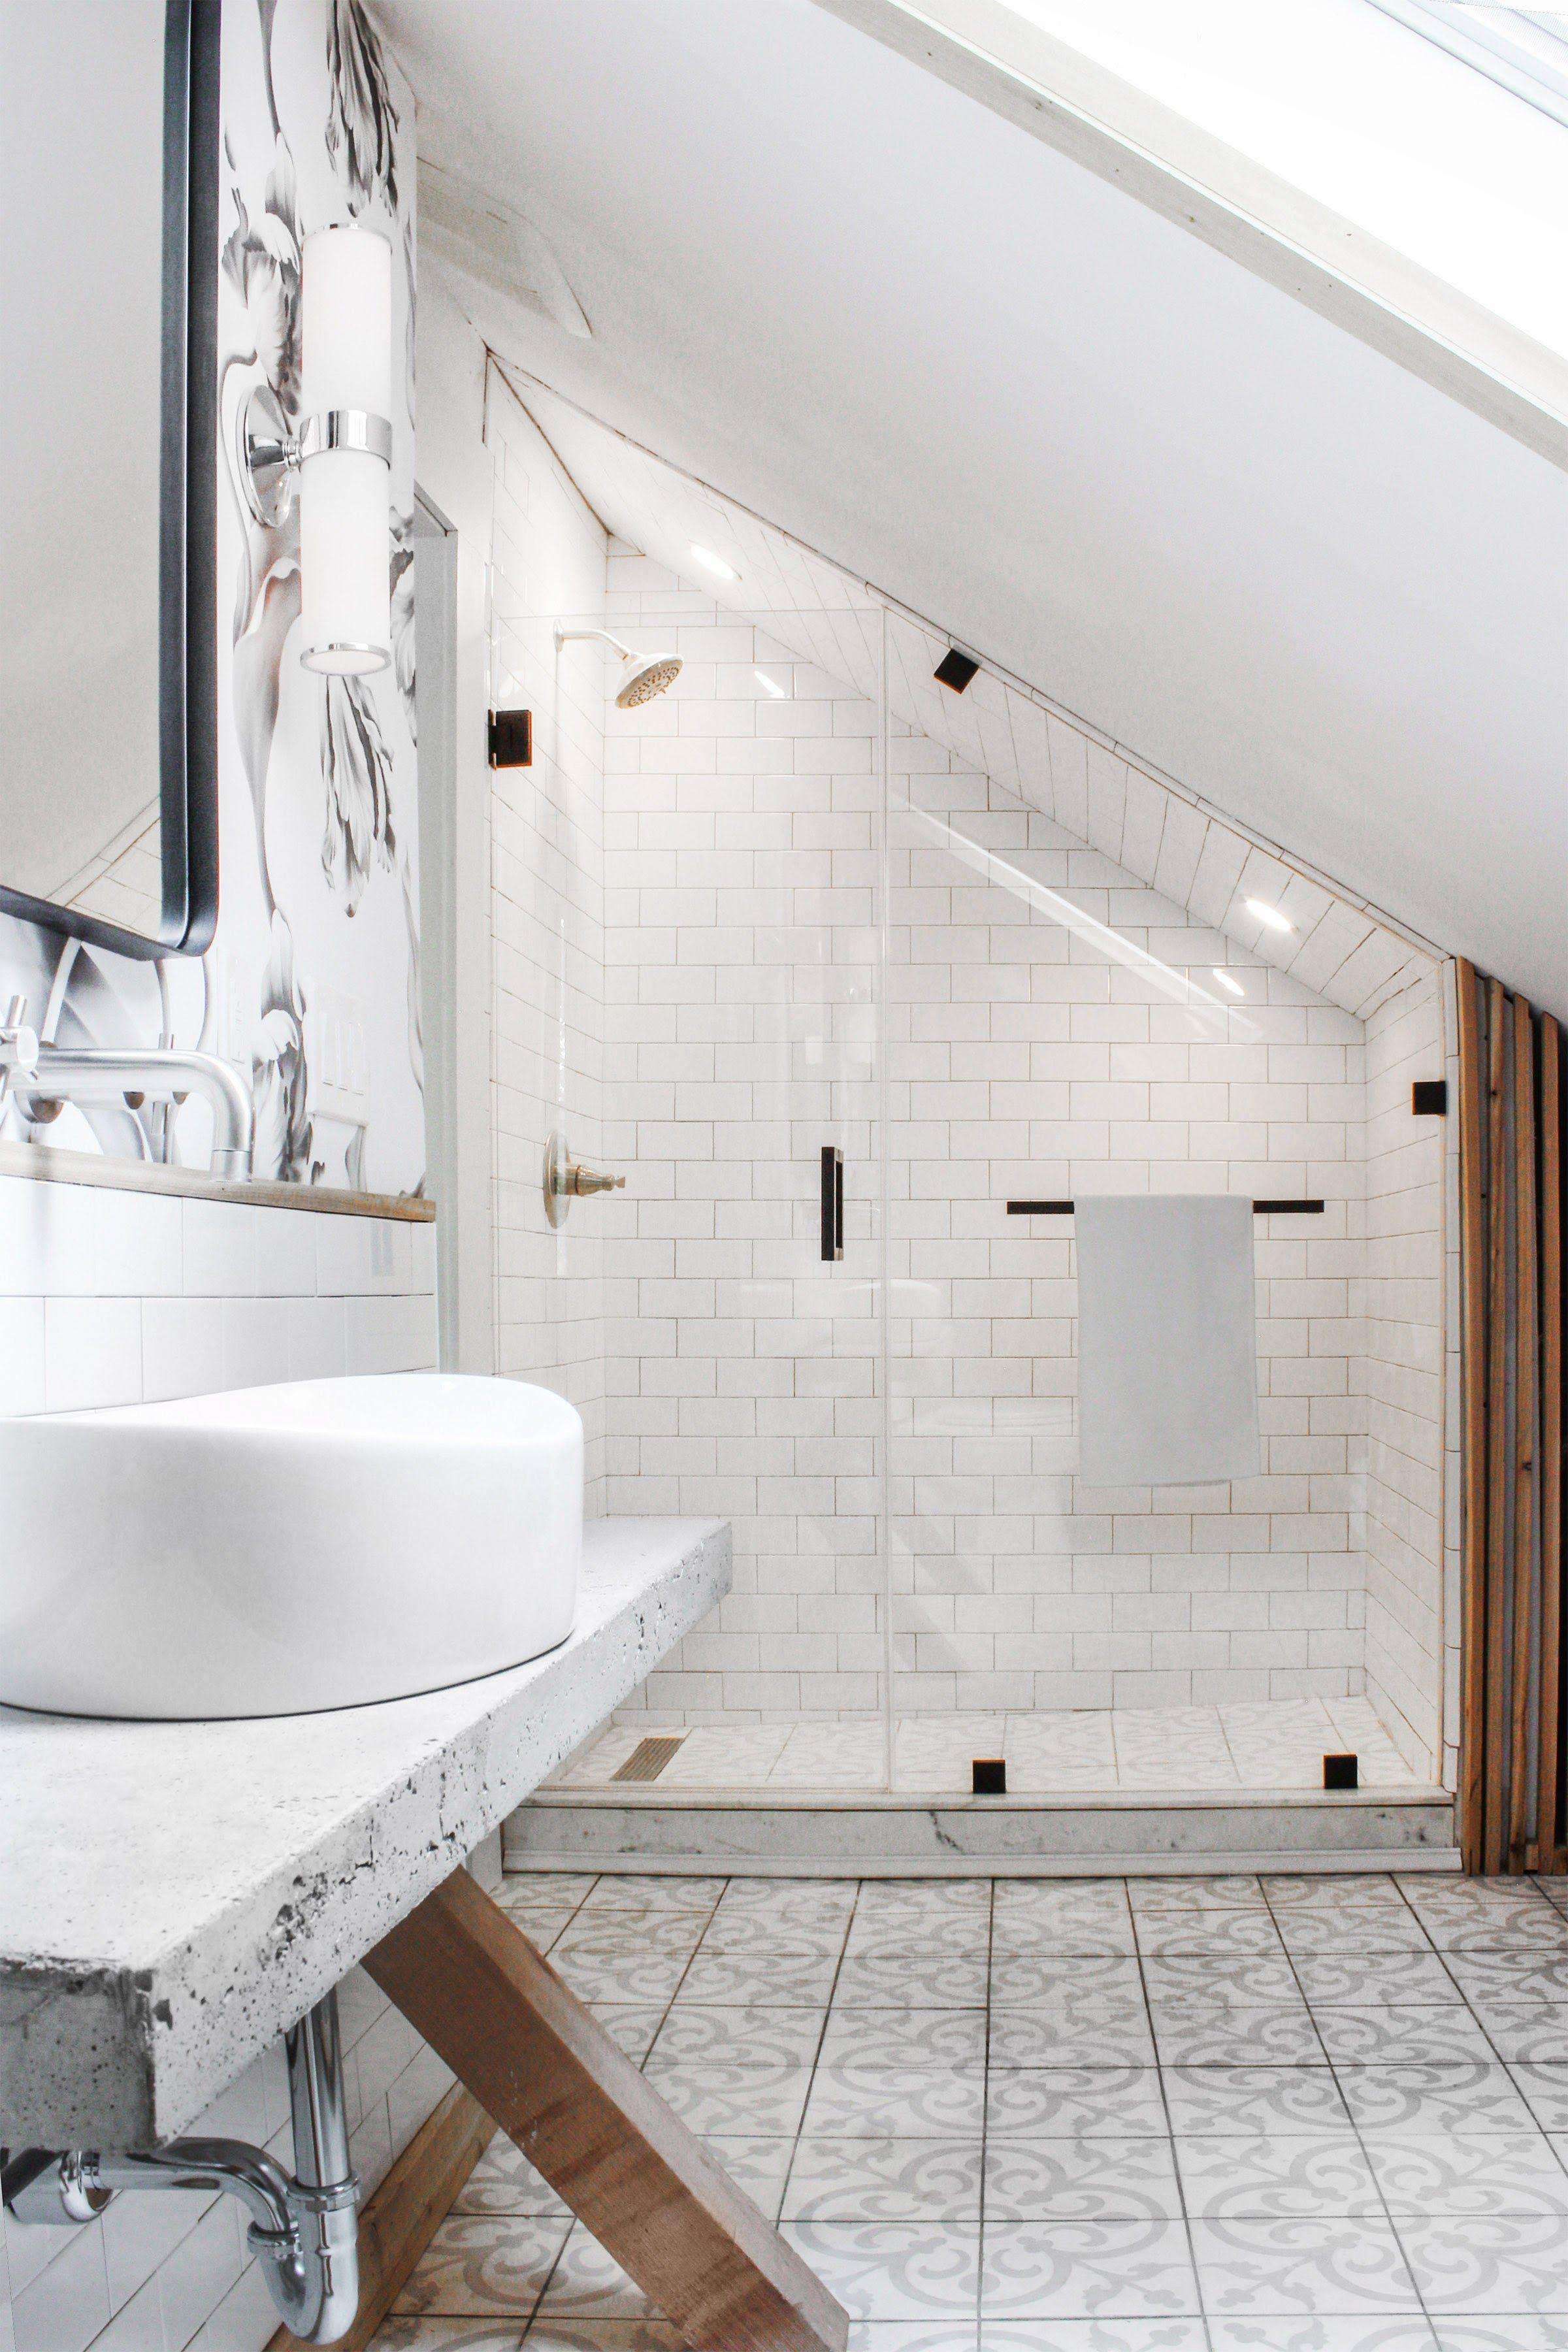 Pin by Riad Tile on Riad Tile - Allegro  Small attic bathroom